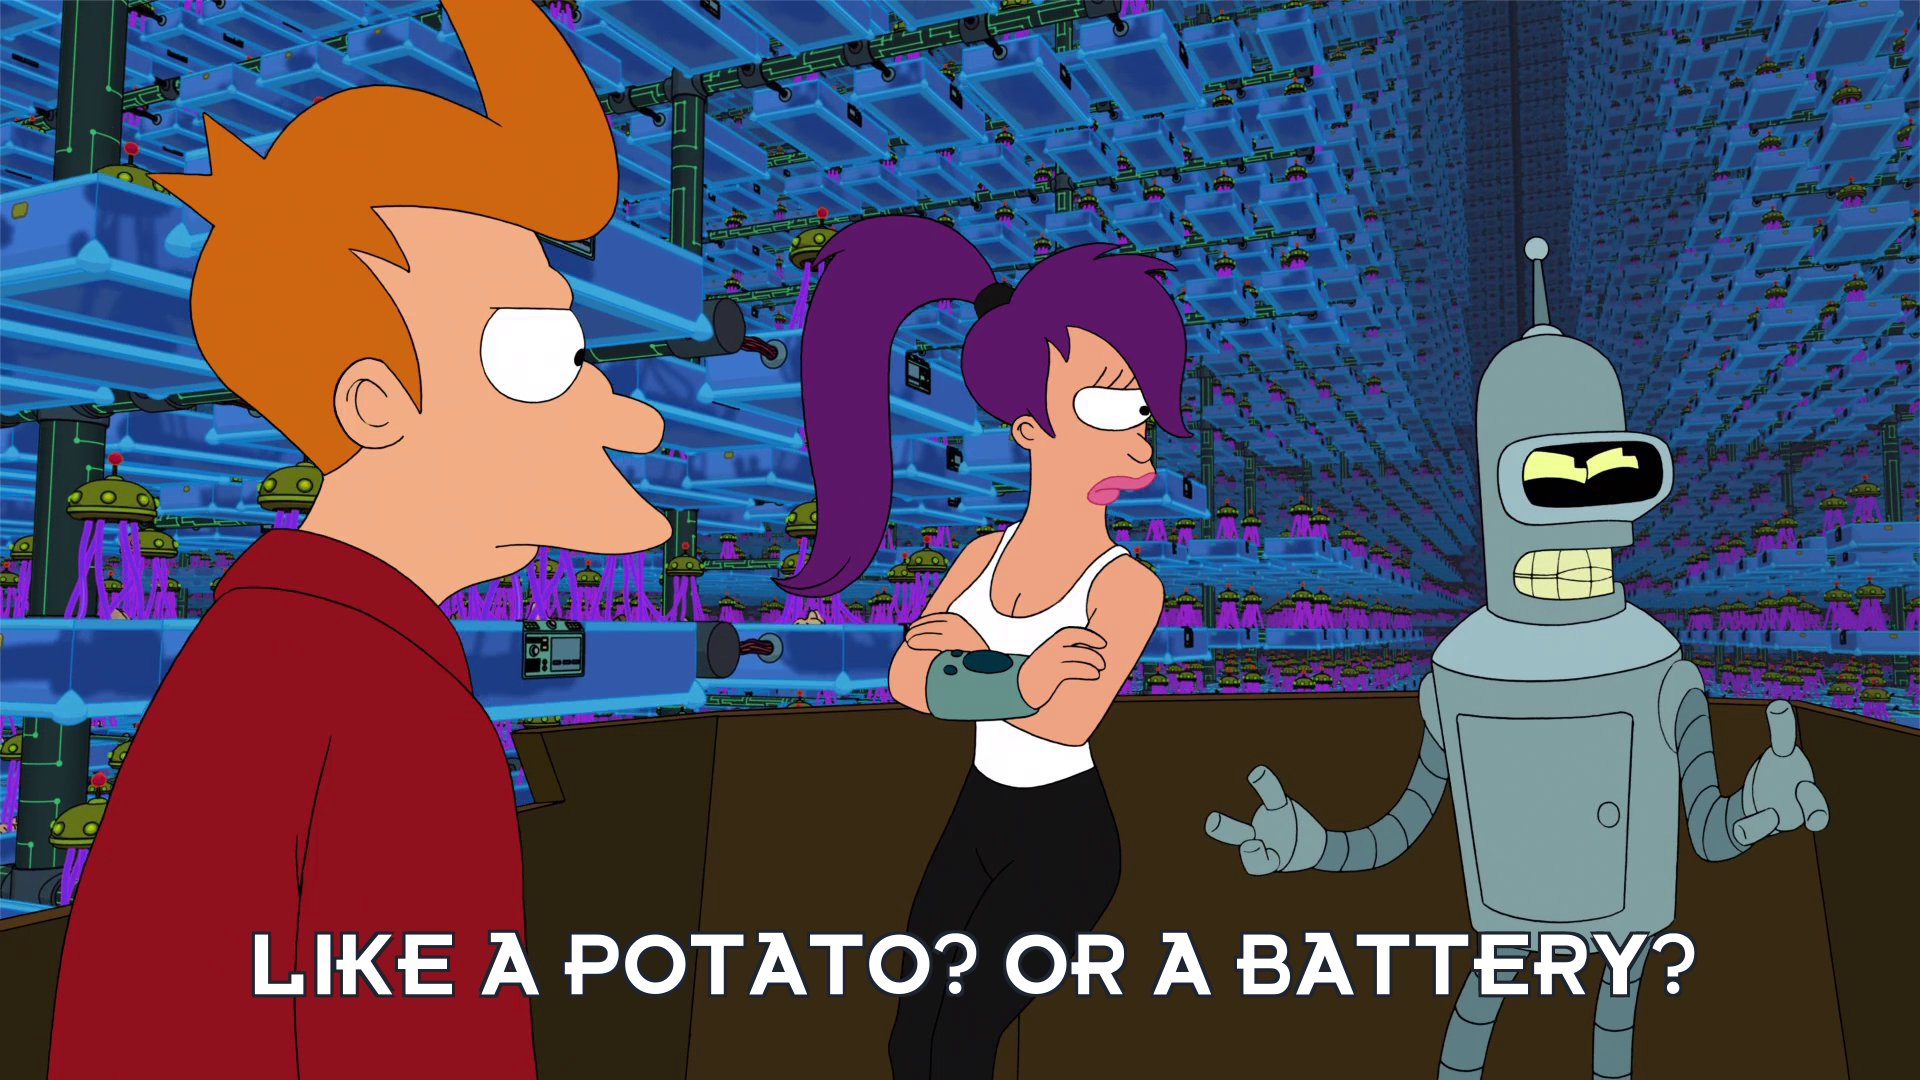 Bender Bending Rodriguez: Like a potato? Or a battery?